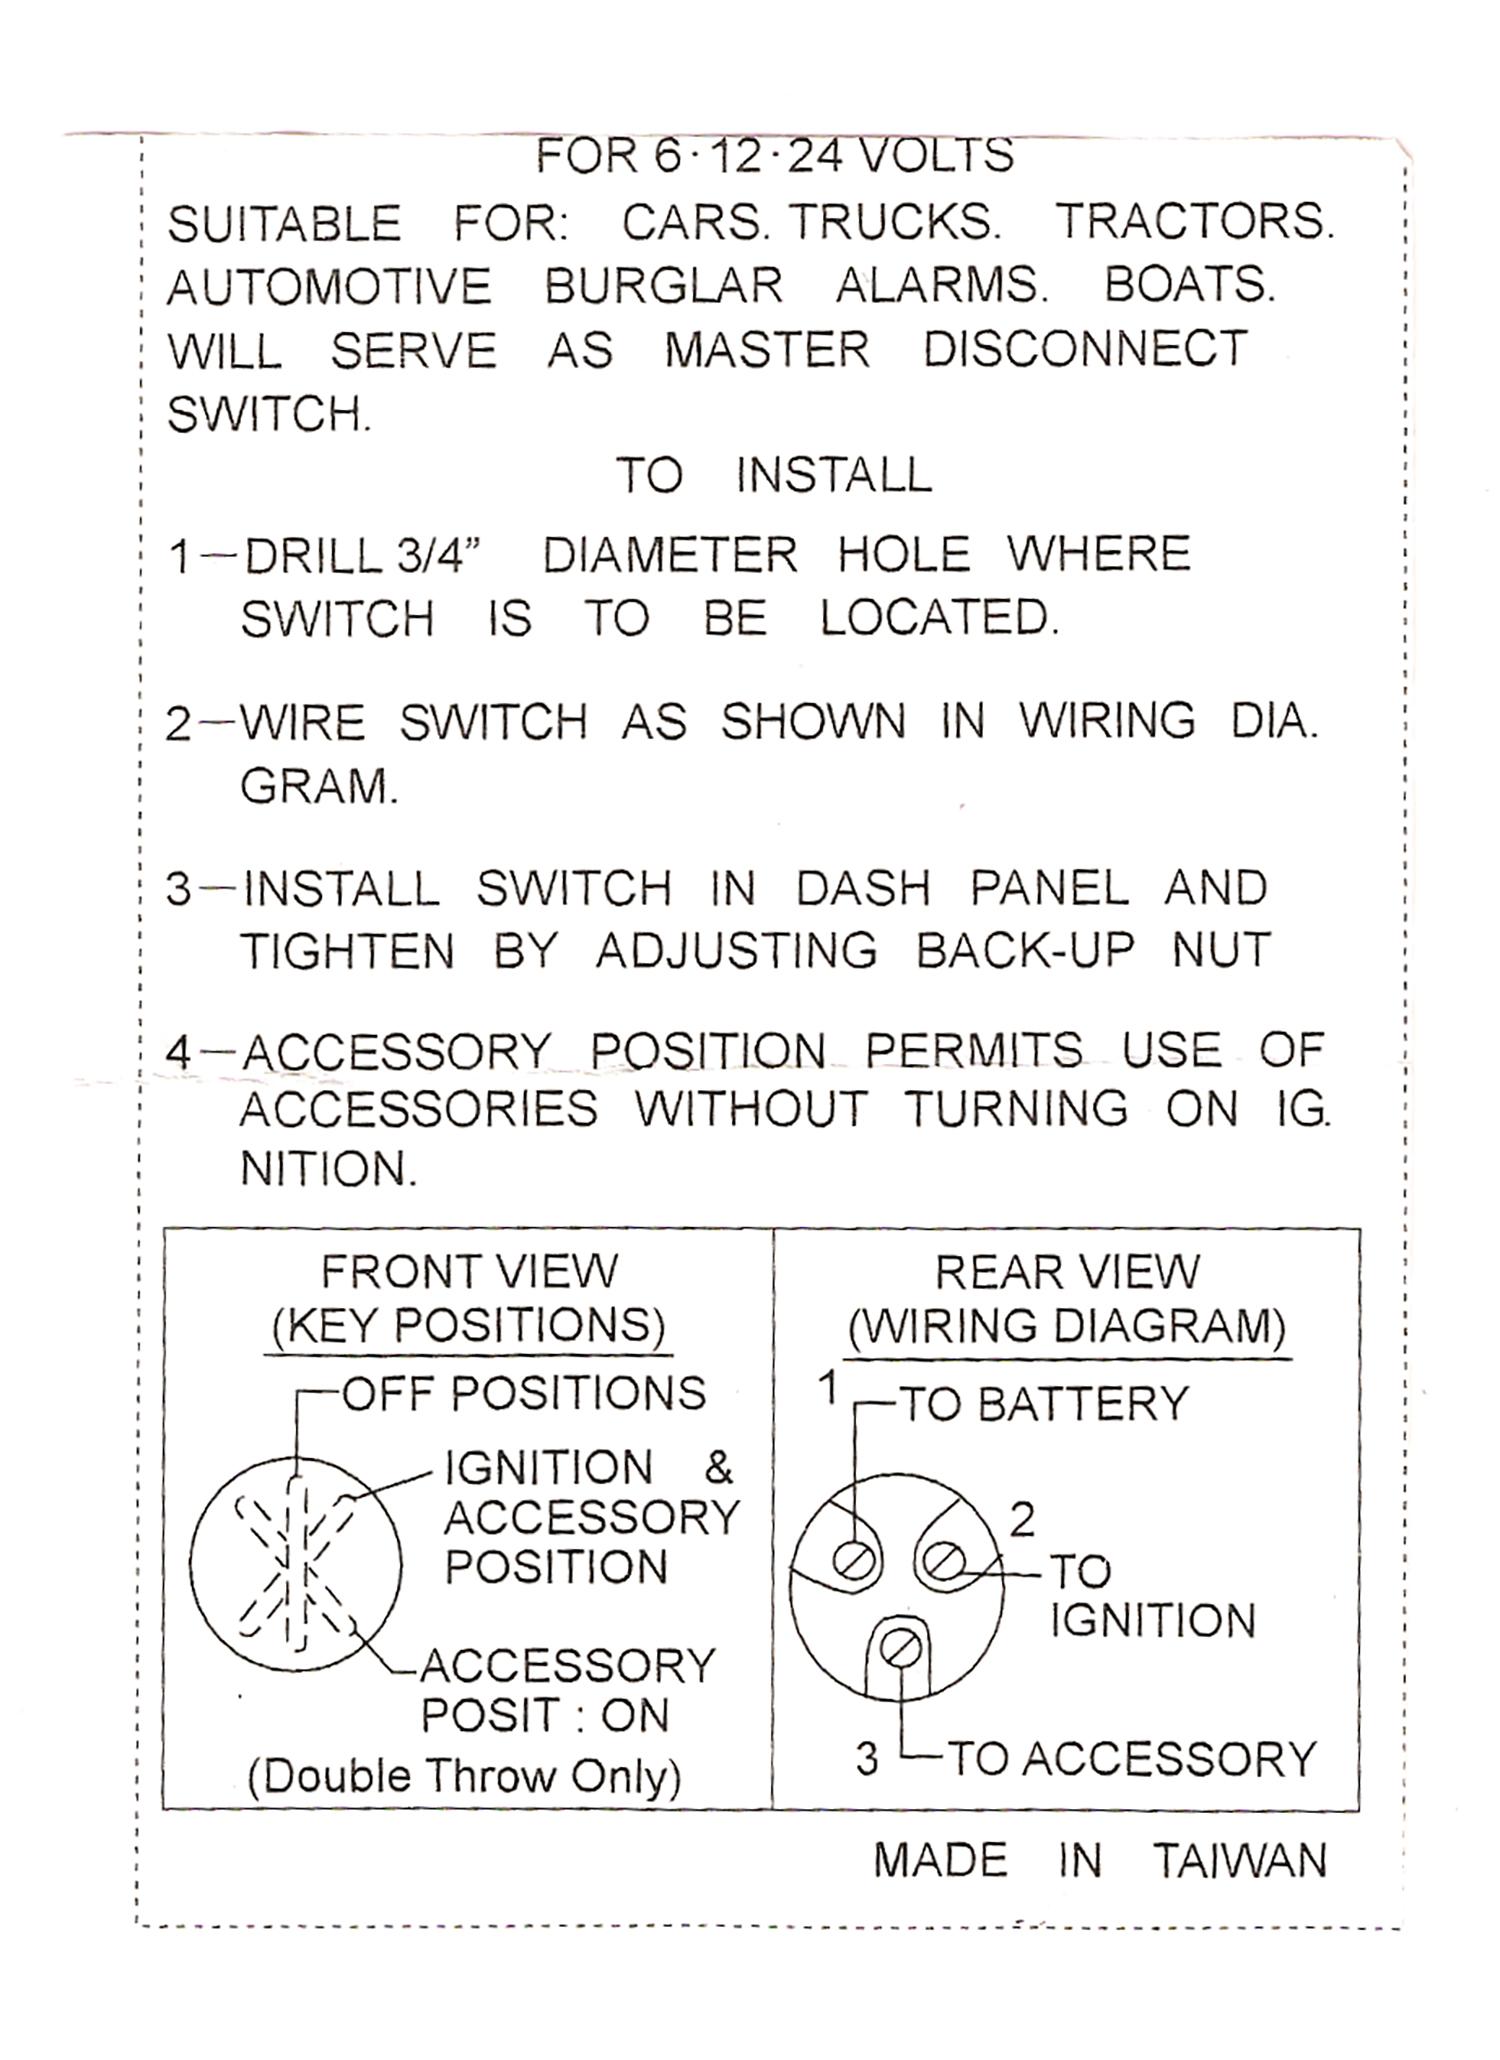 Universal Ignition Switch Wiring : universal, ignition, switch, wiring, Universal, Ignition, Switch, Position, 40-64000, Wiring, Diagram